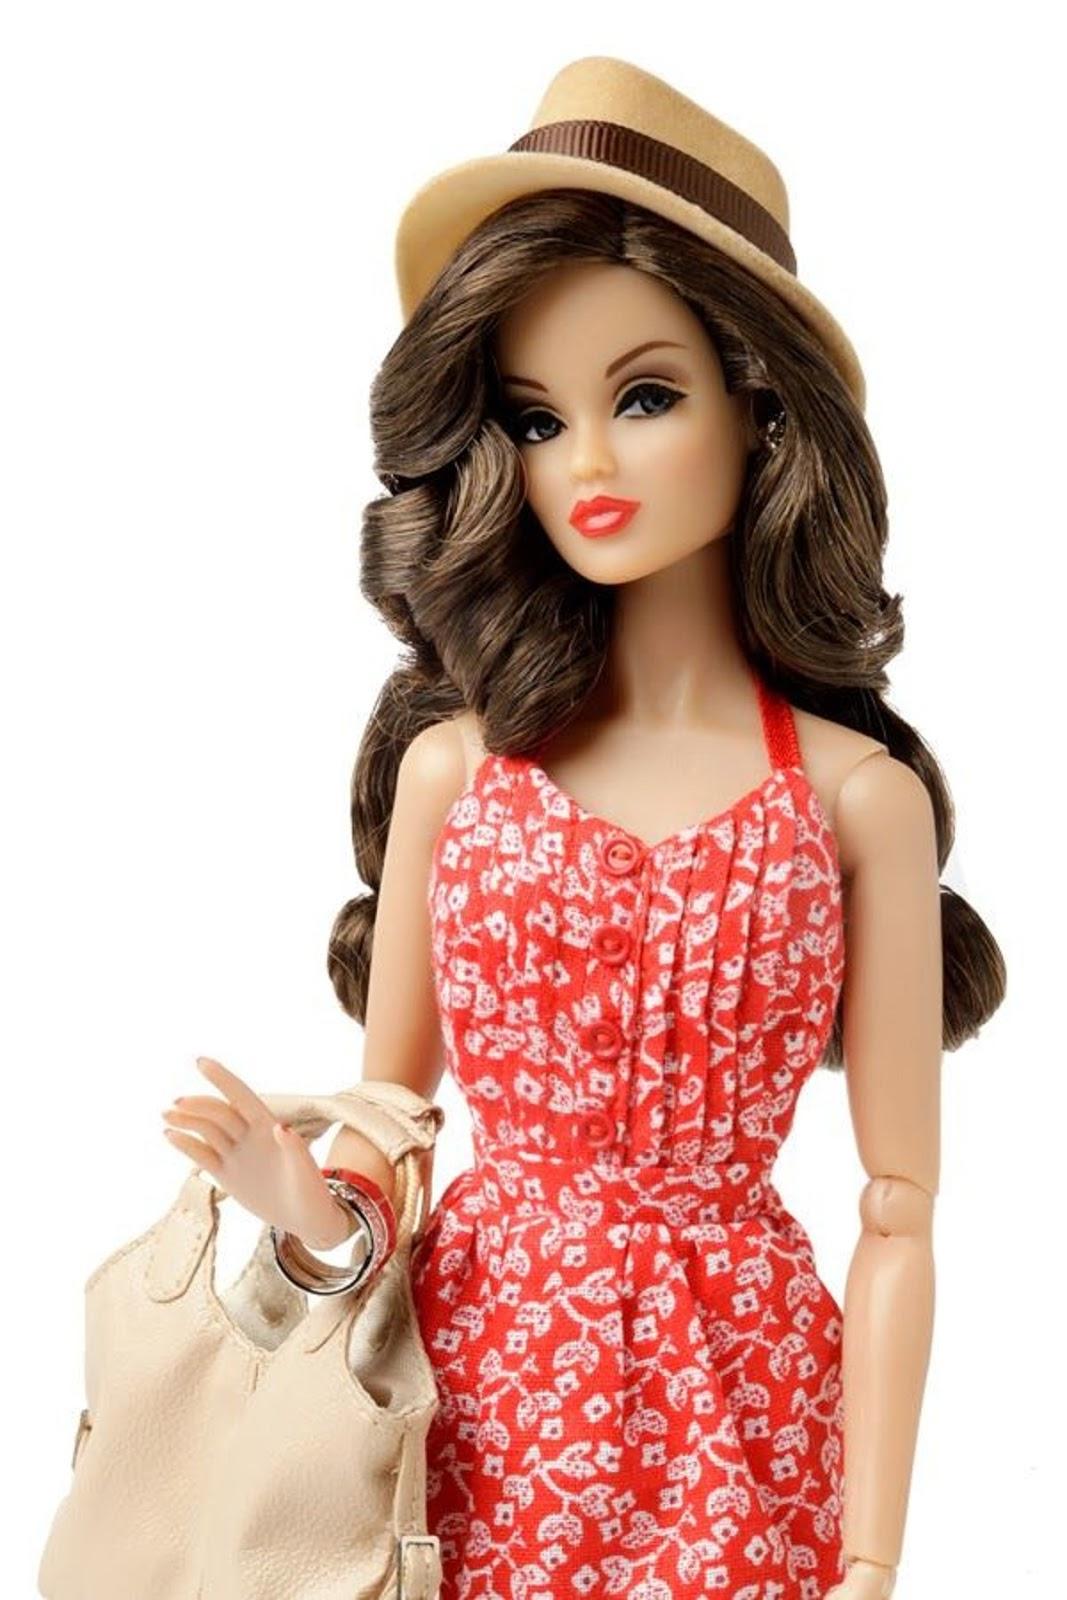 Cute baby barbie doll wallpaper beautiful desktop hd wallpapers download - Barbie barbie barbie barbie barbie ...